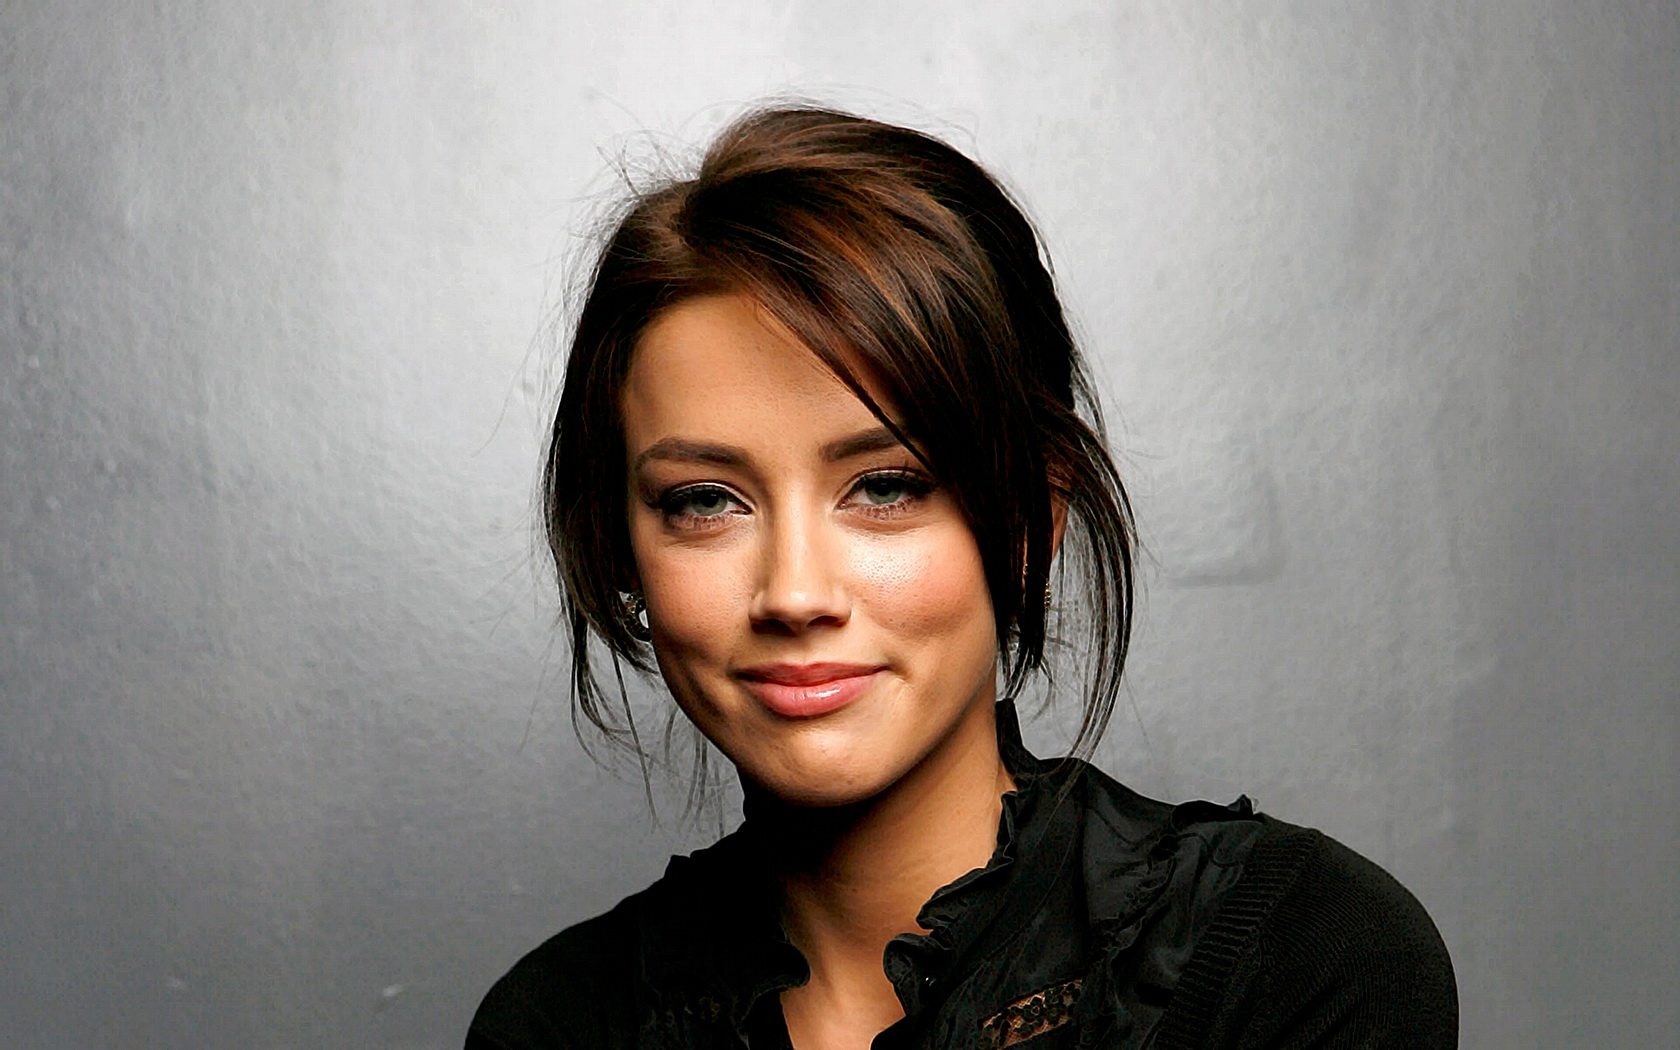 brunettes women actress - photo #10